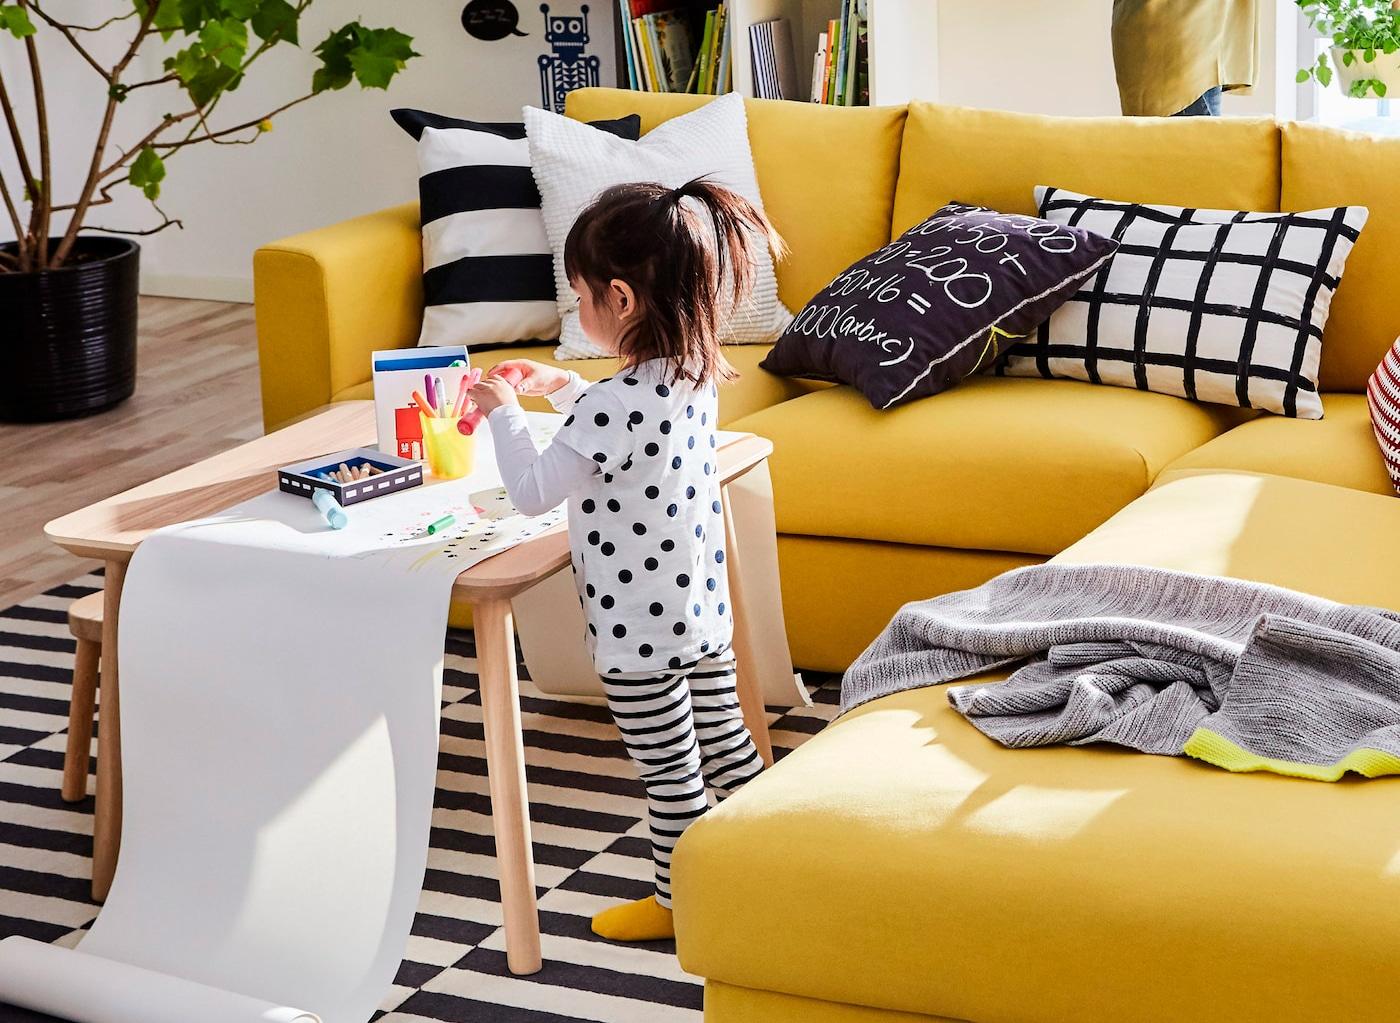 Sofa tiga tempat duduk IKEA VIMLE berwarna kuning memberi banyak keselesaan dan sedikit sinar mentari ke dalam ruang tamu anda.